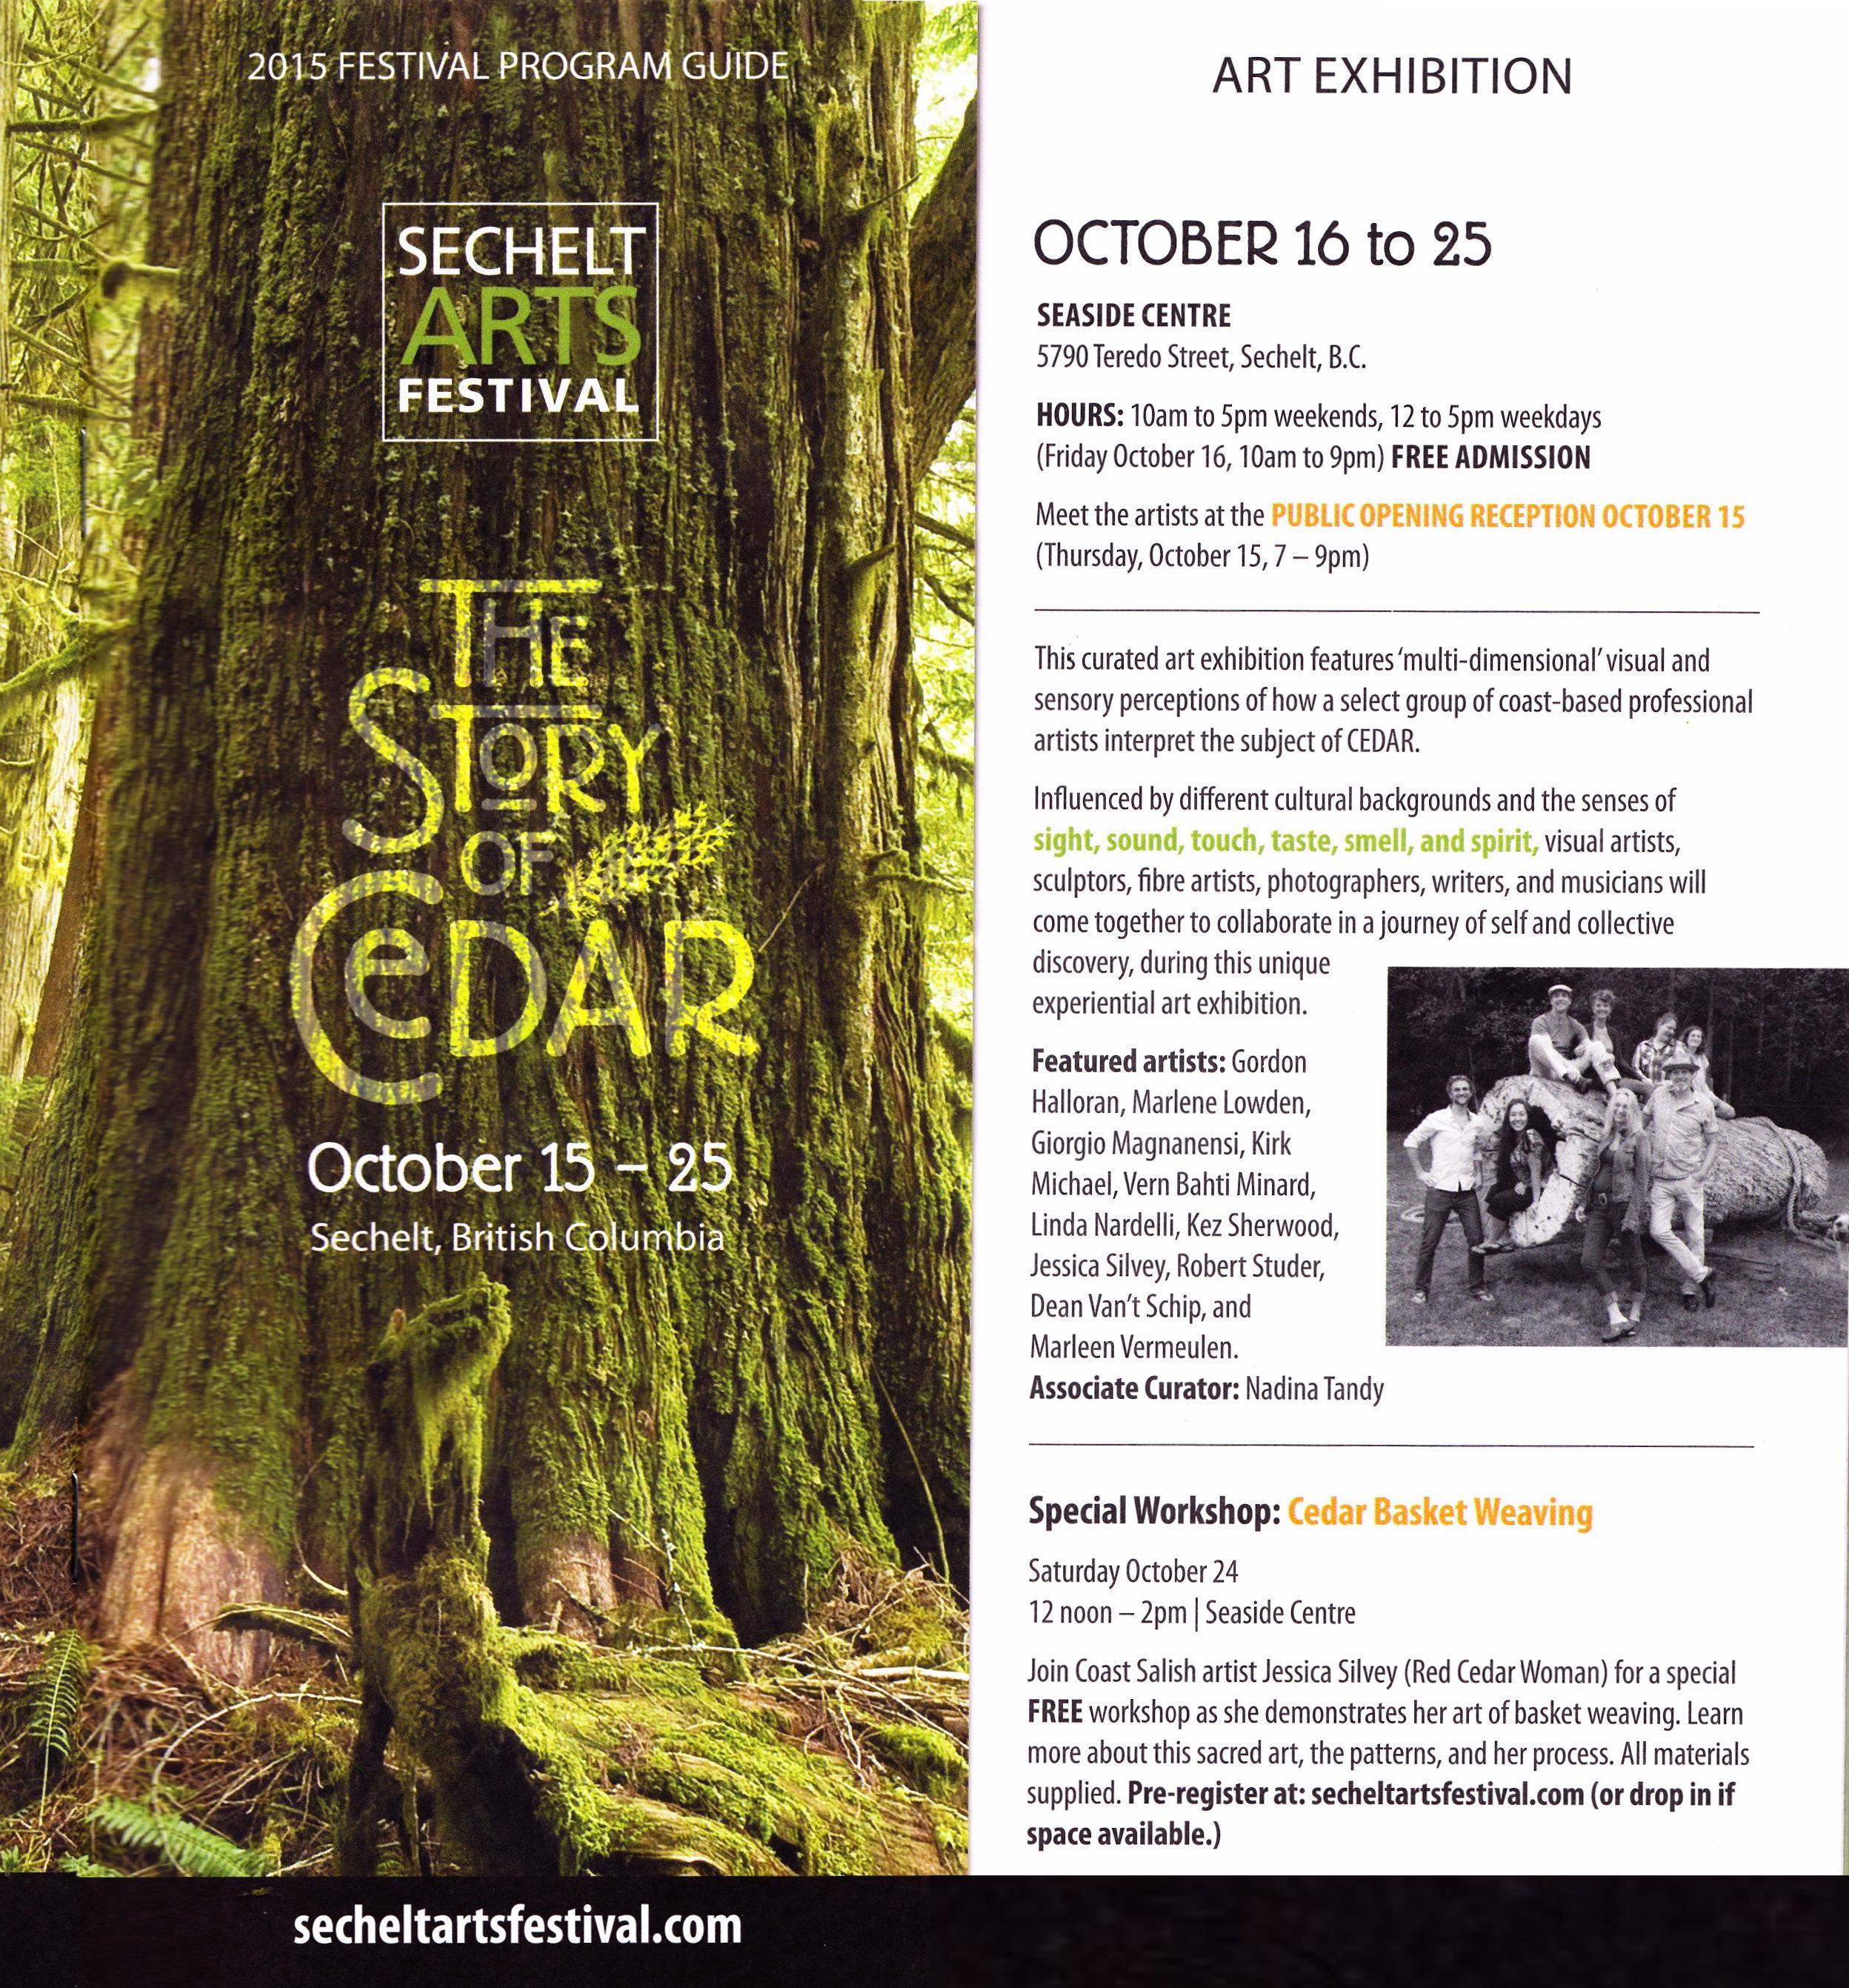 The Story of Cedar 2